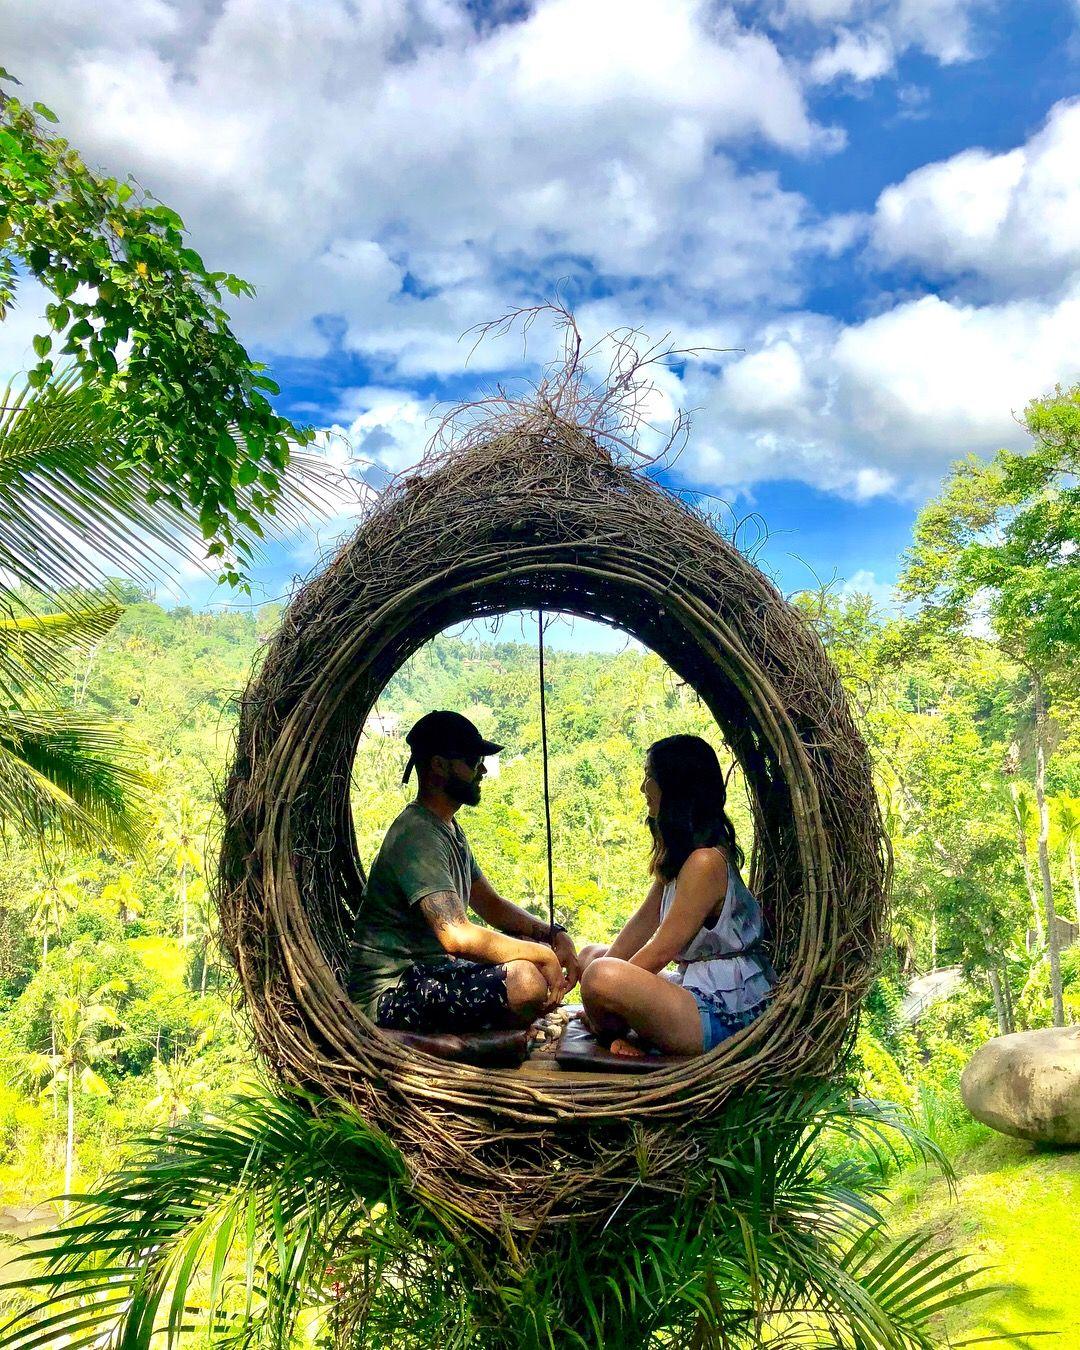 Bali Swing Nest Bali Indonesia Desain